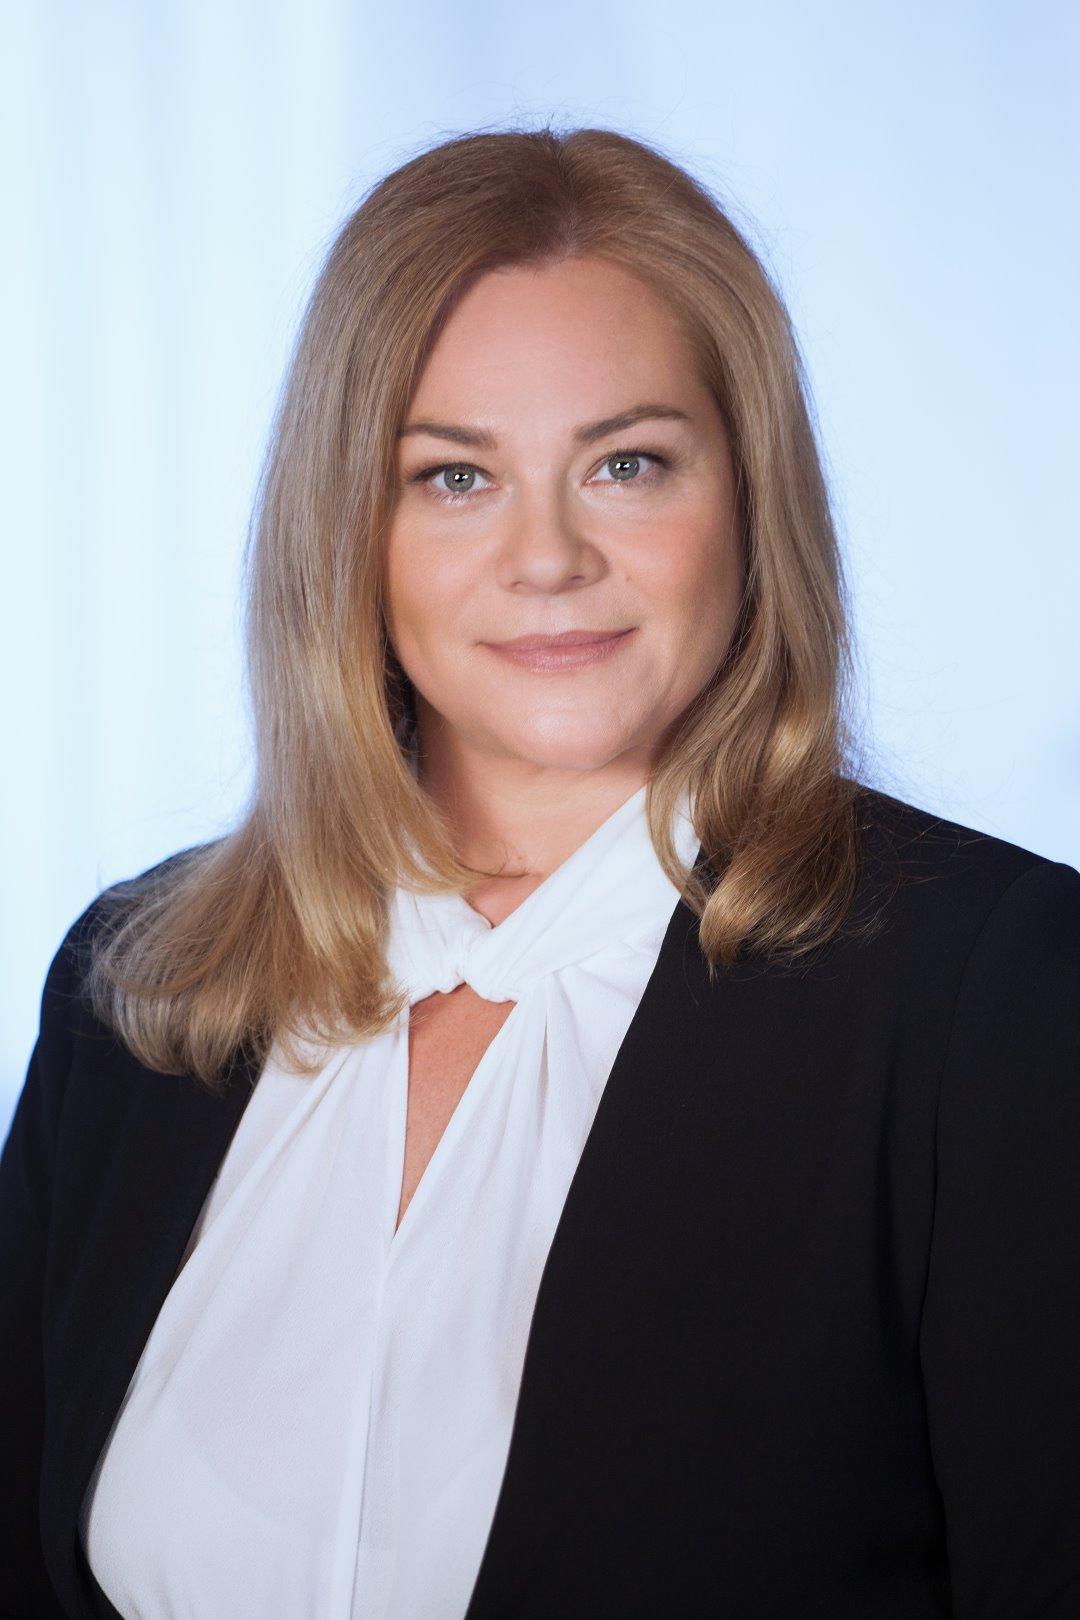 Cornelia Saborowski